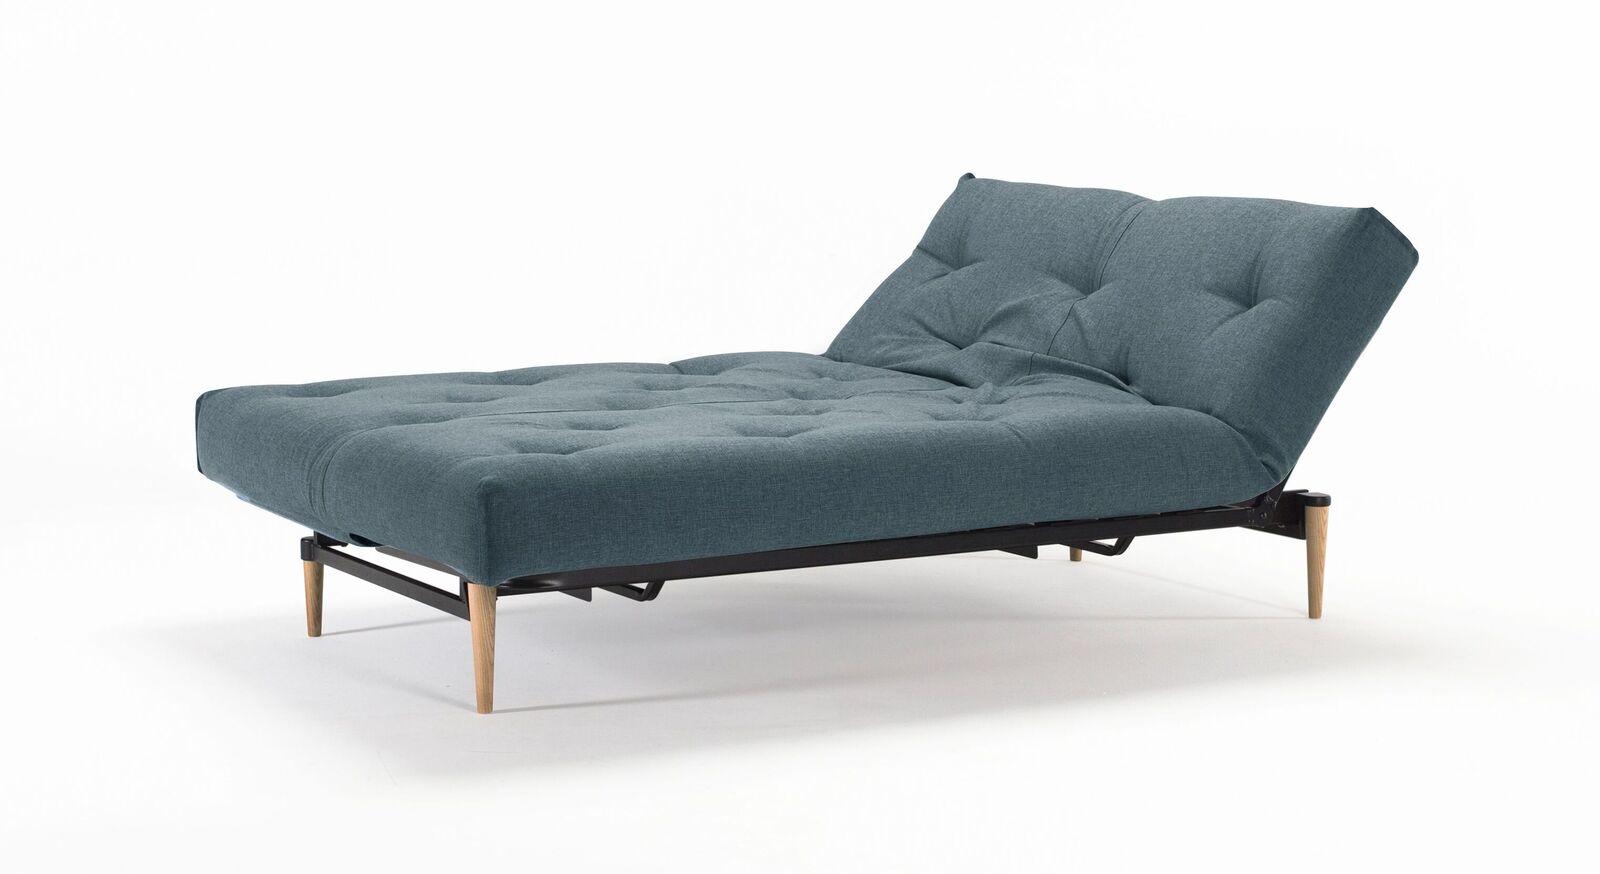 Schlafsofa Shapiro in Doppelbett-Größe